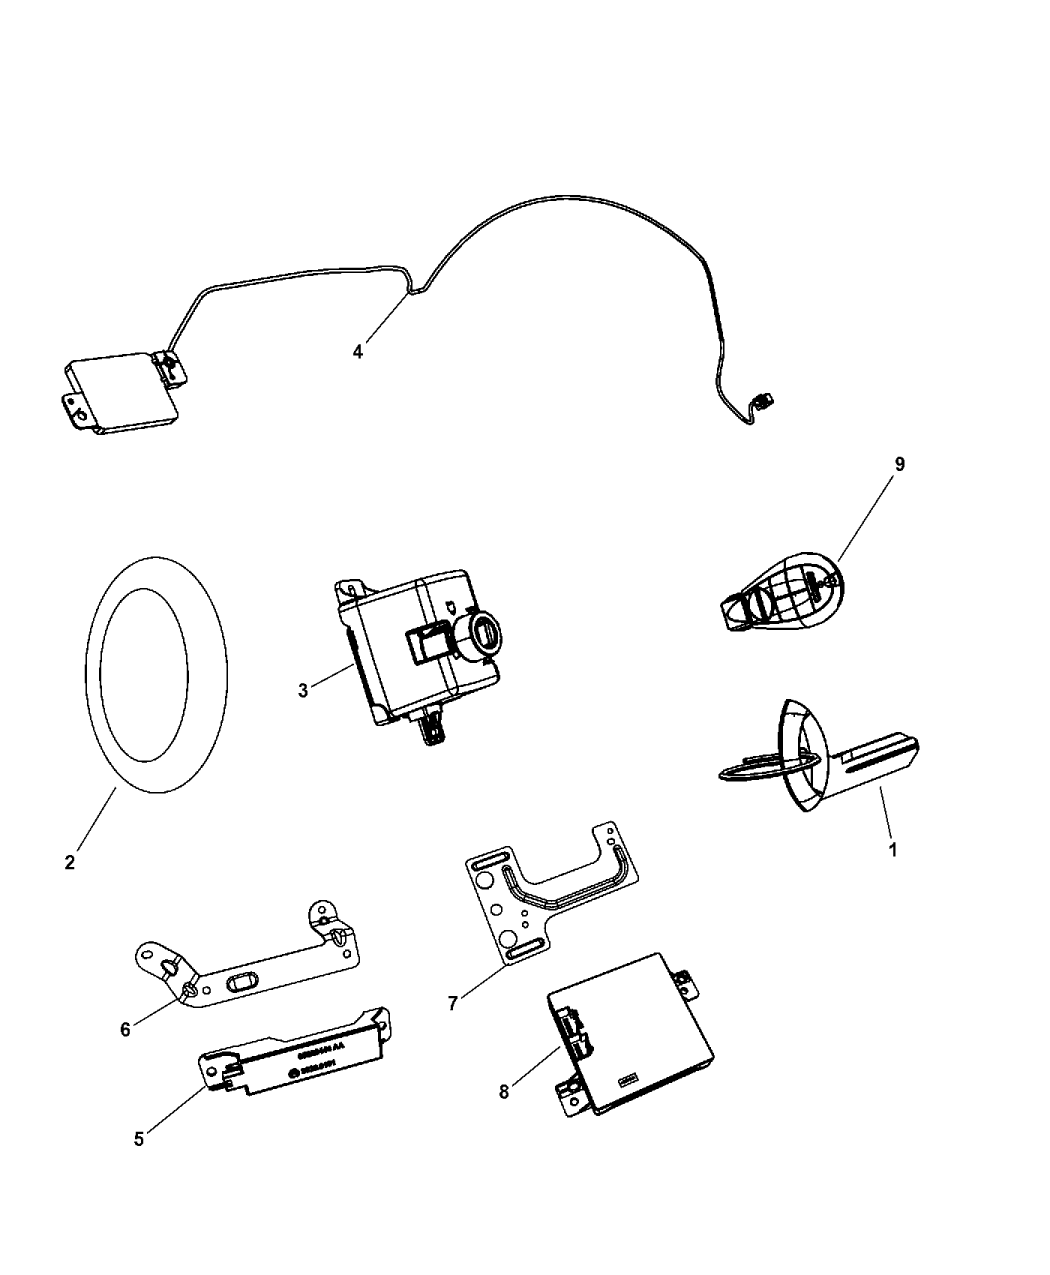 2011 Dodge Grand Caravan Receiver Modules Keys Key Fobs Electric Ke Wiring Diagram